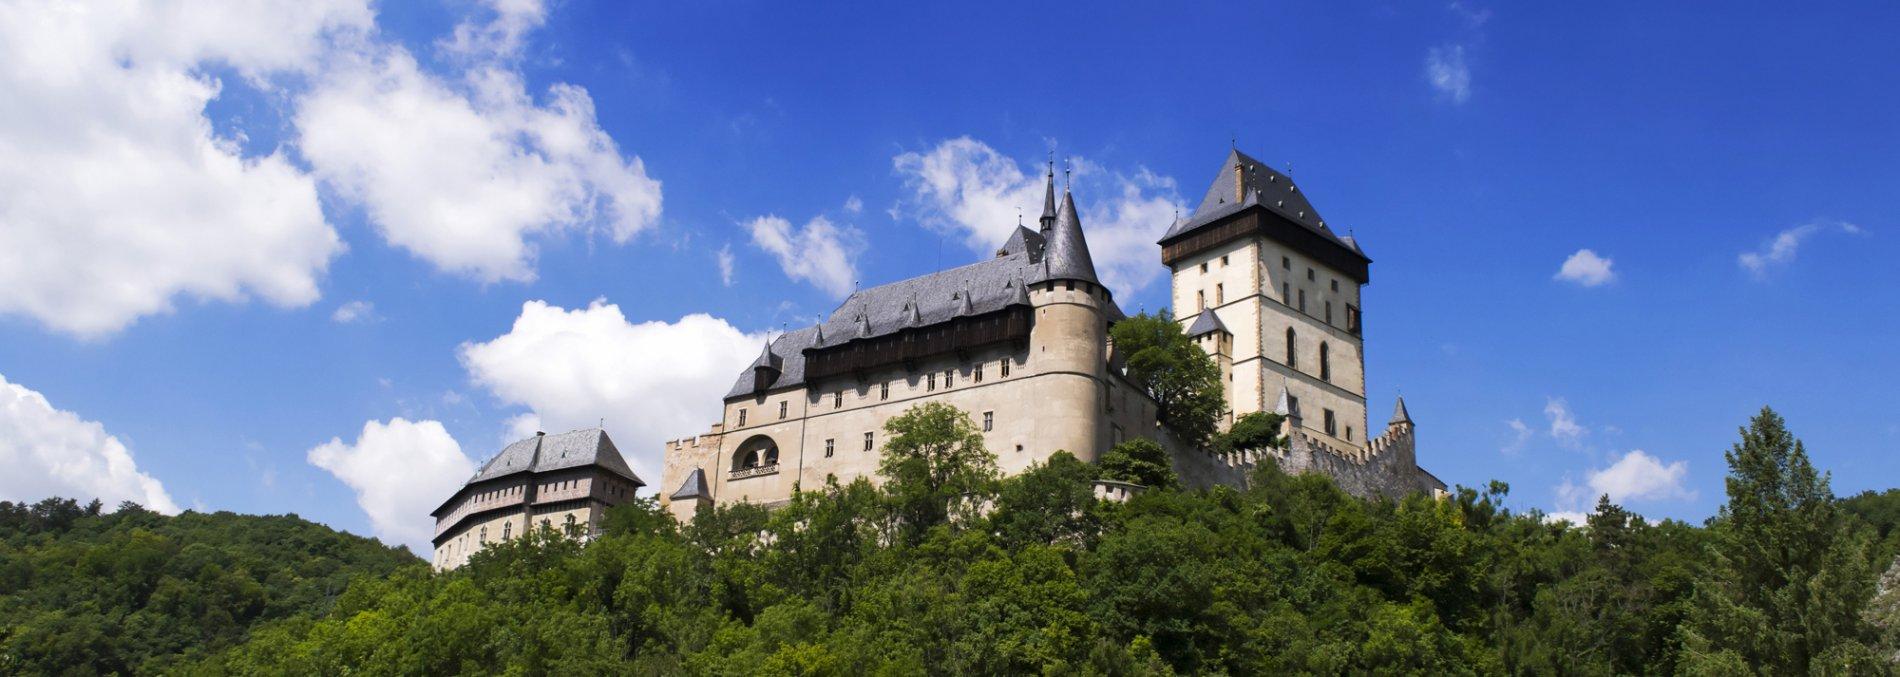 Karlstejn Castle Tour – Prague to Karlstejn Castle